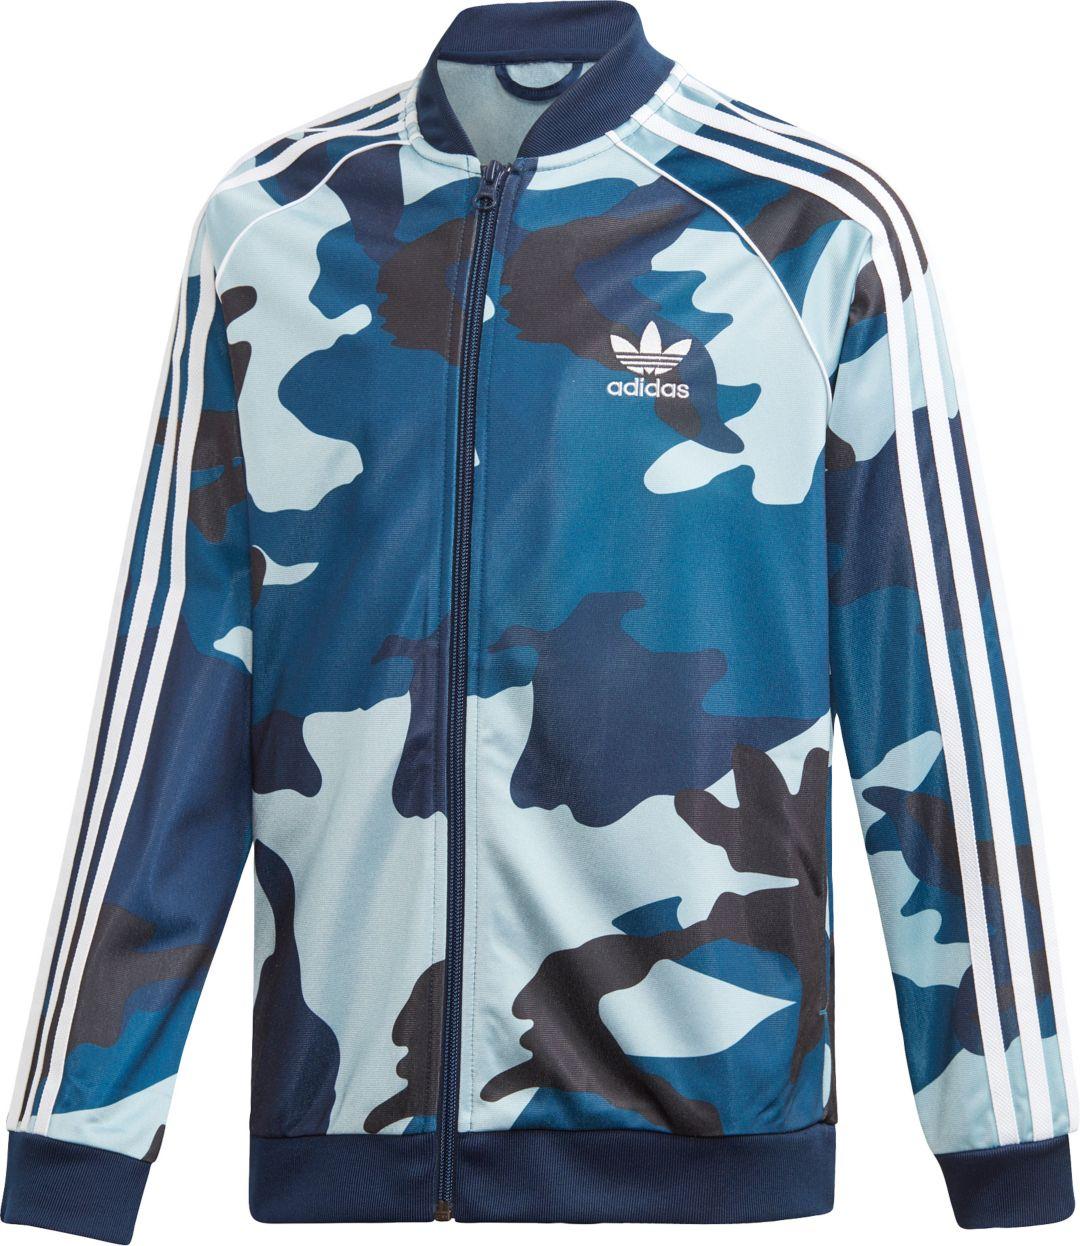 7741ecb21 adidas Boys' Camo Print Superstar Jacket | DICK'S Sporting Goods